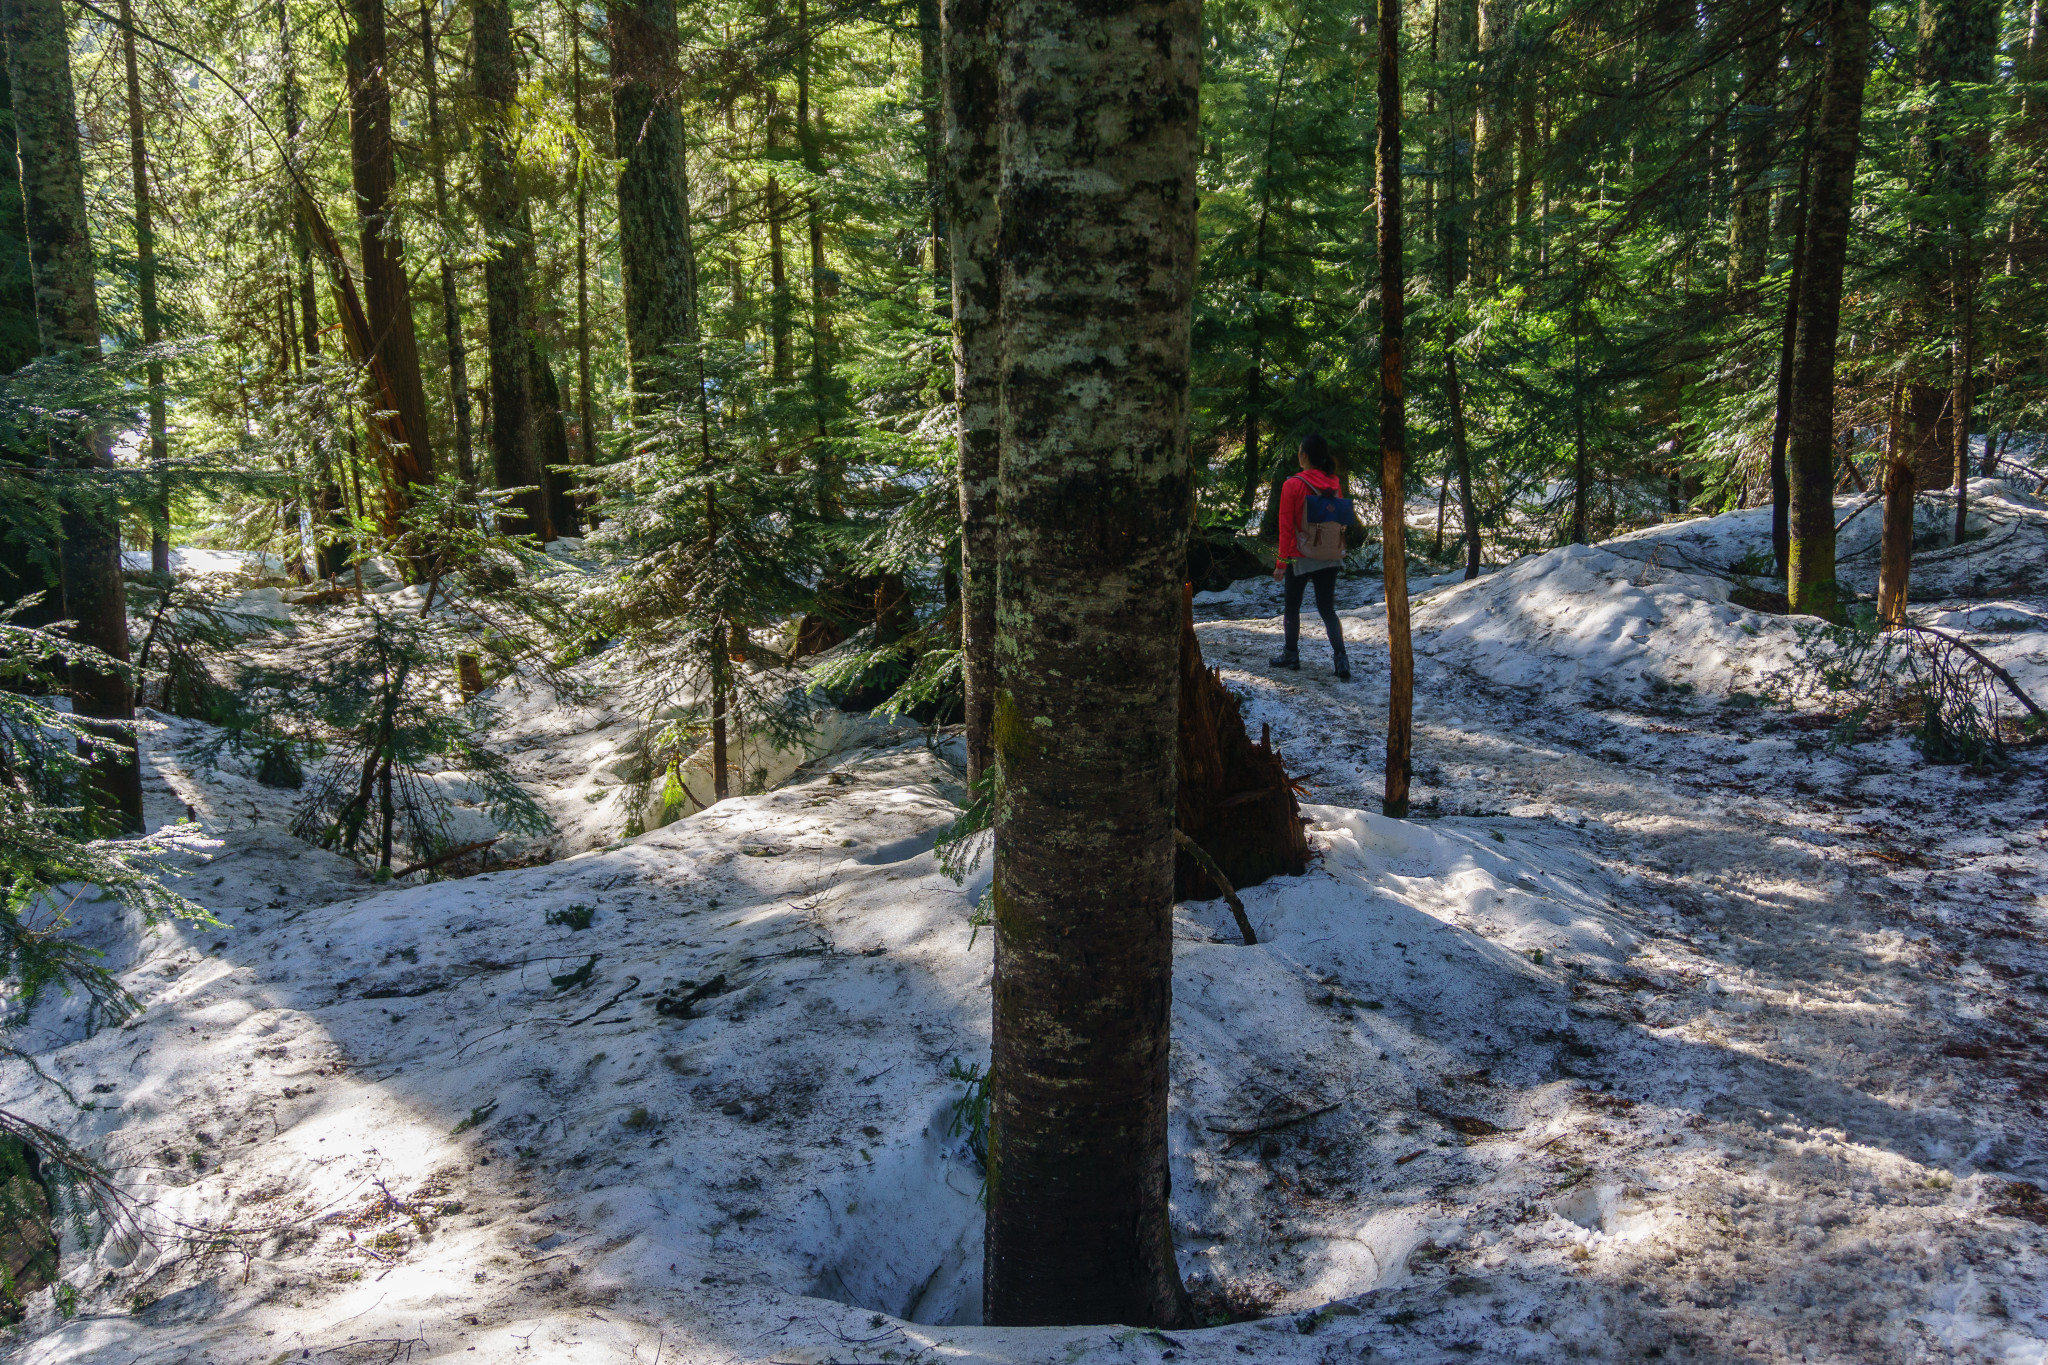 Howe sound trail